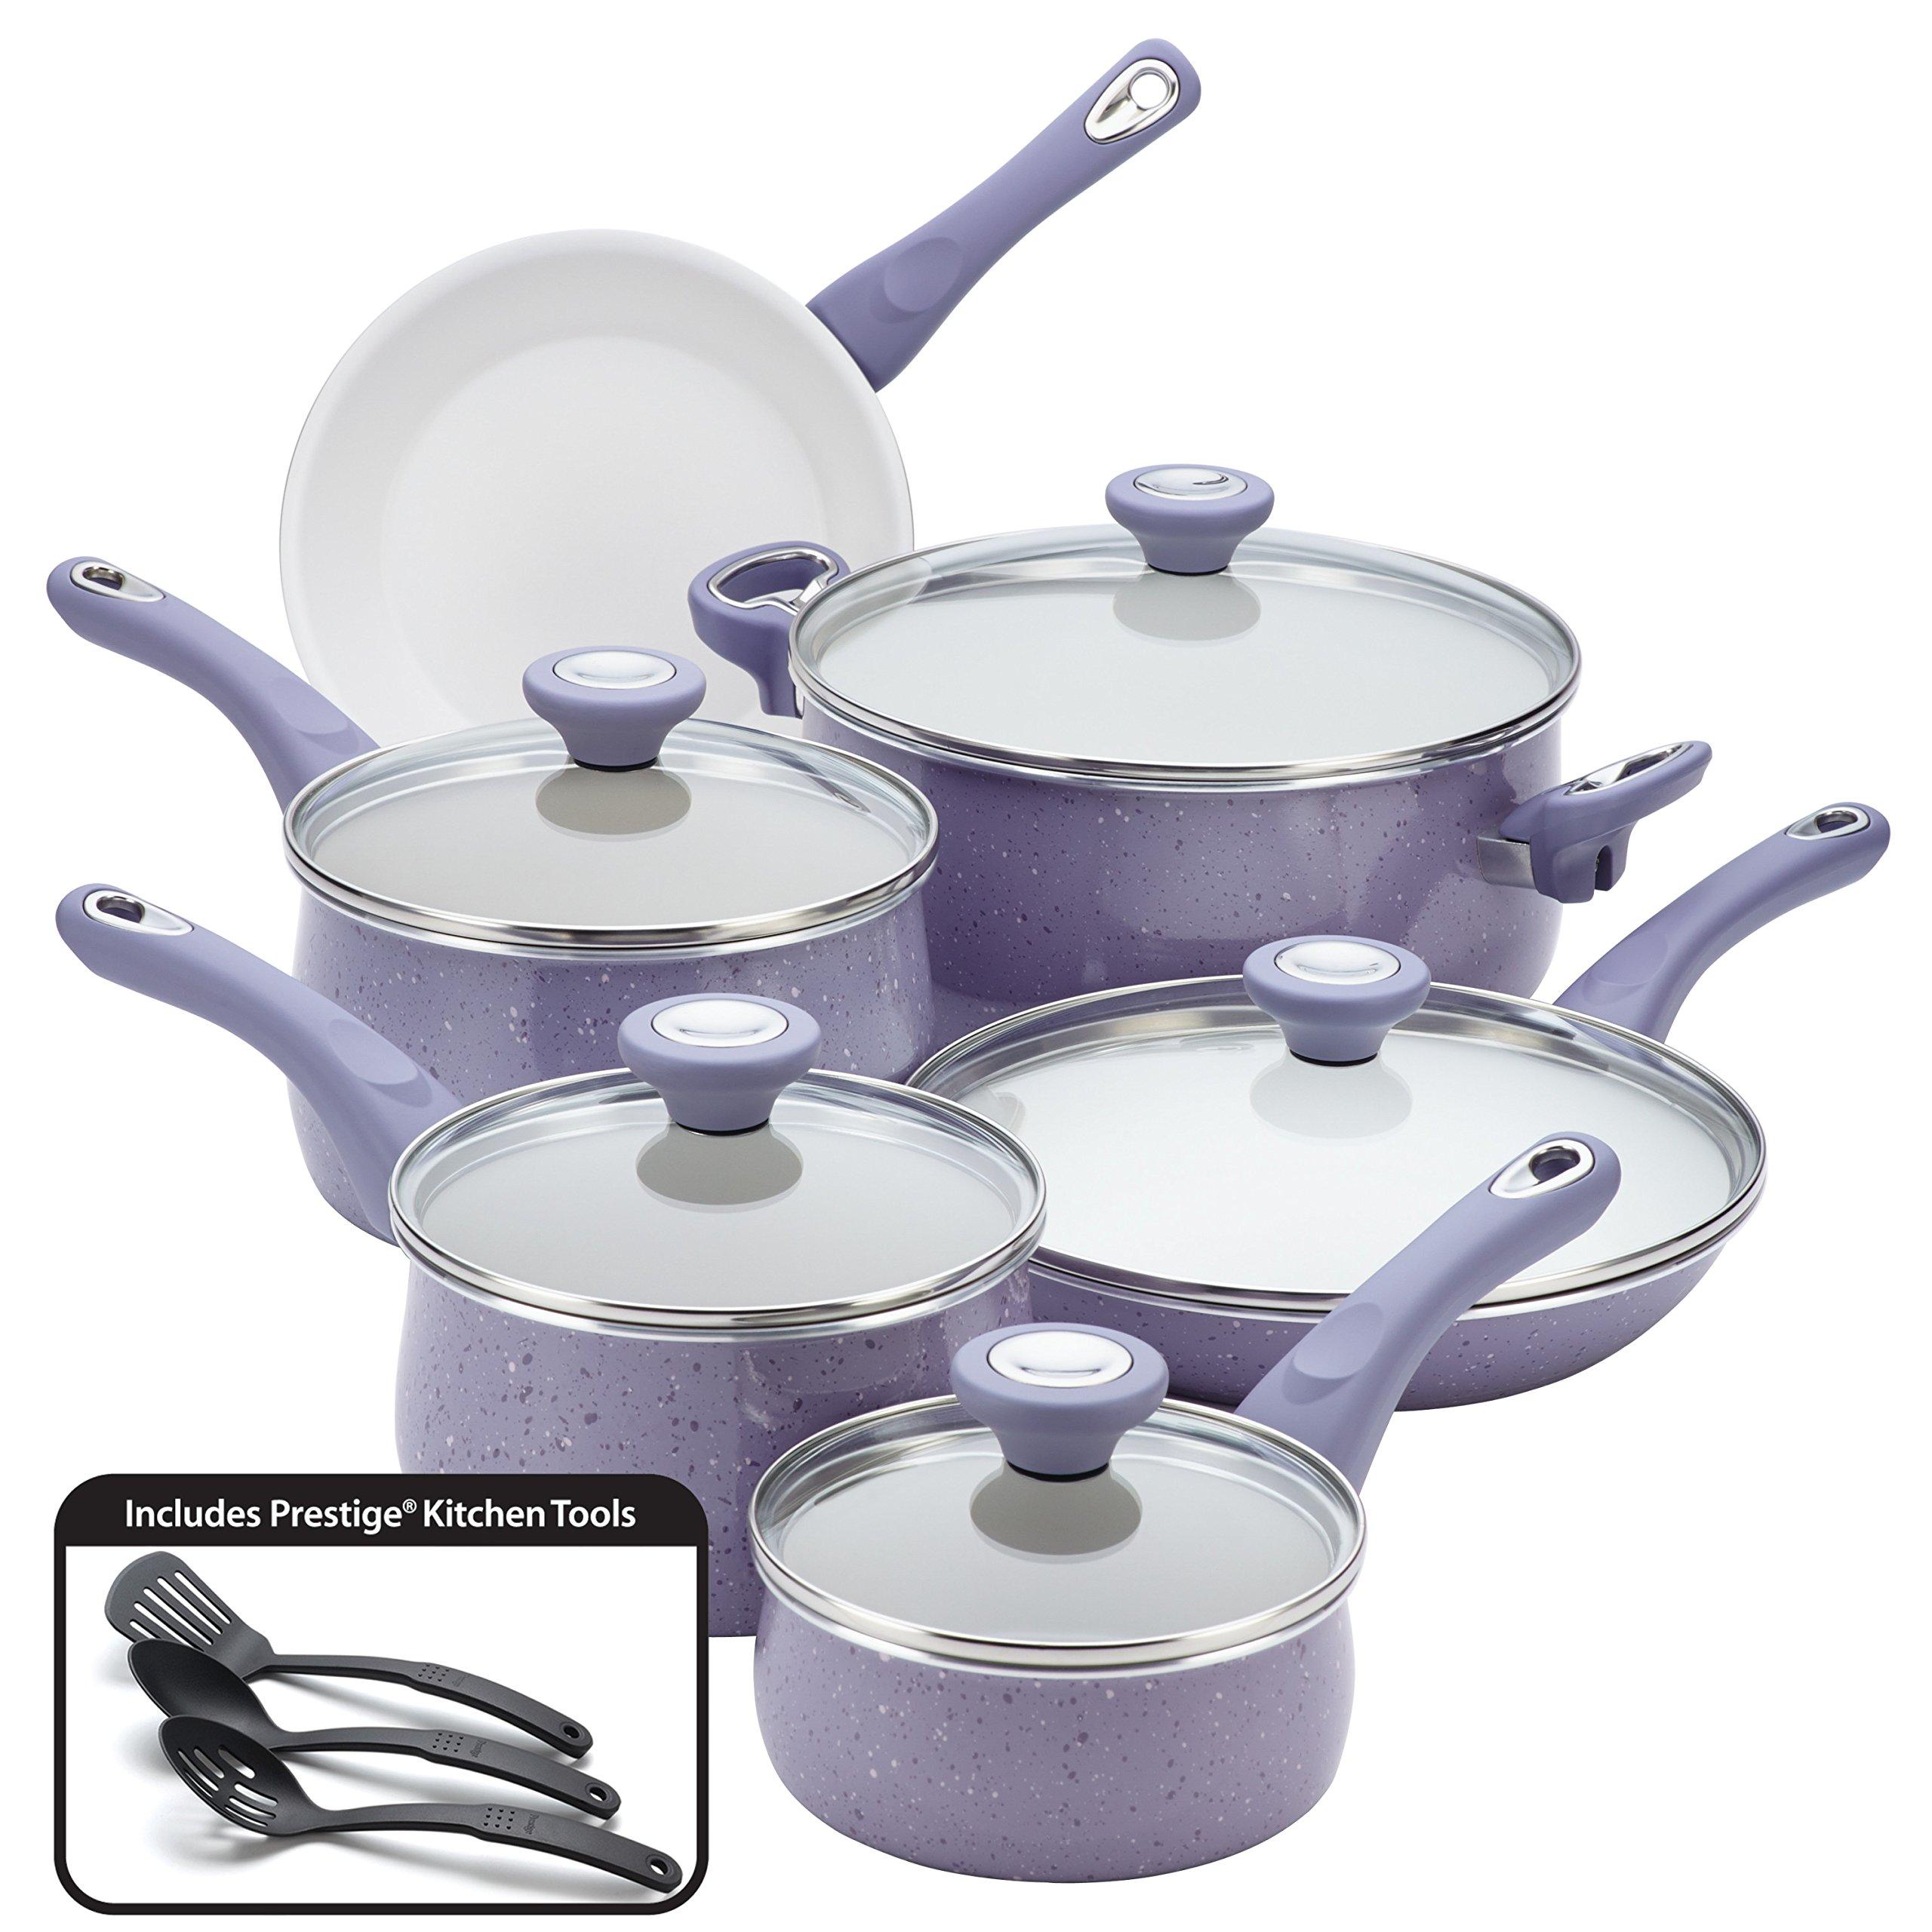 Farberware New Traditions Speckled Aluminum Nonstick 14-Piece Cookware Set, Lavender